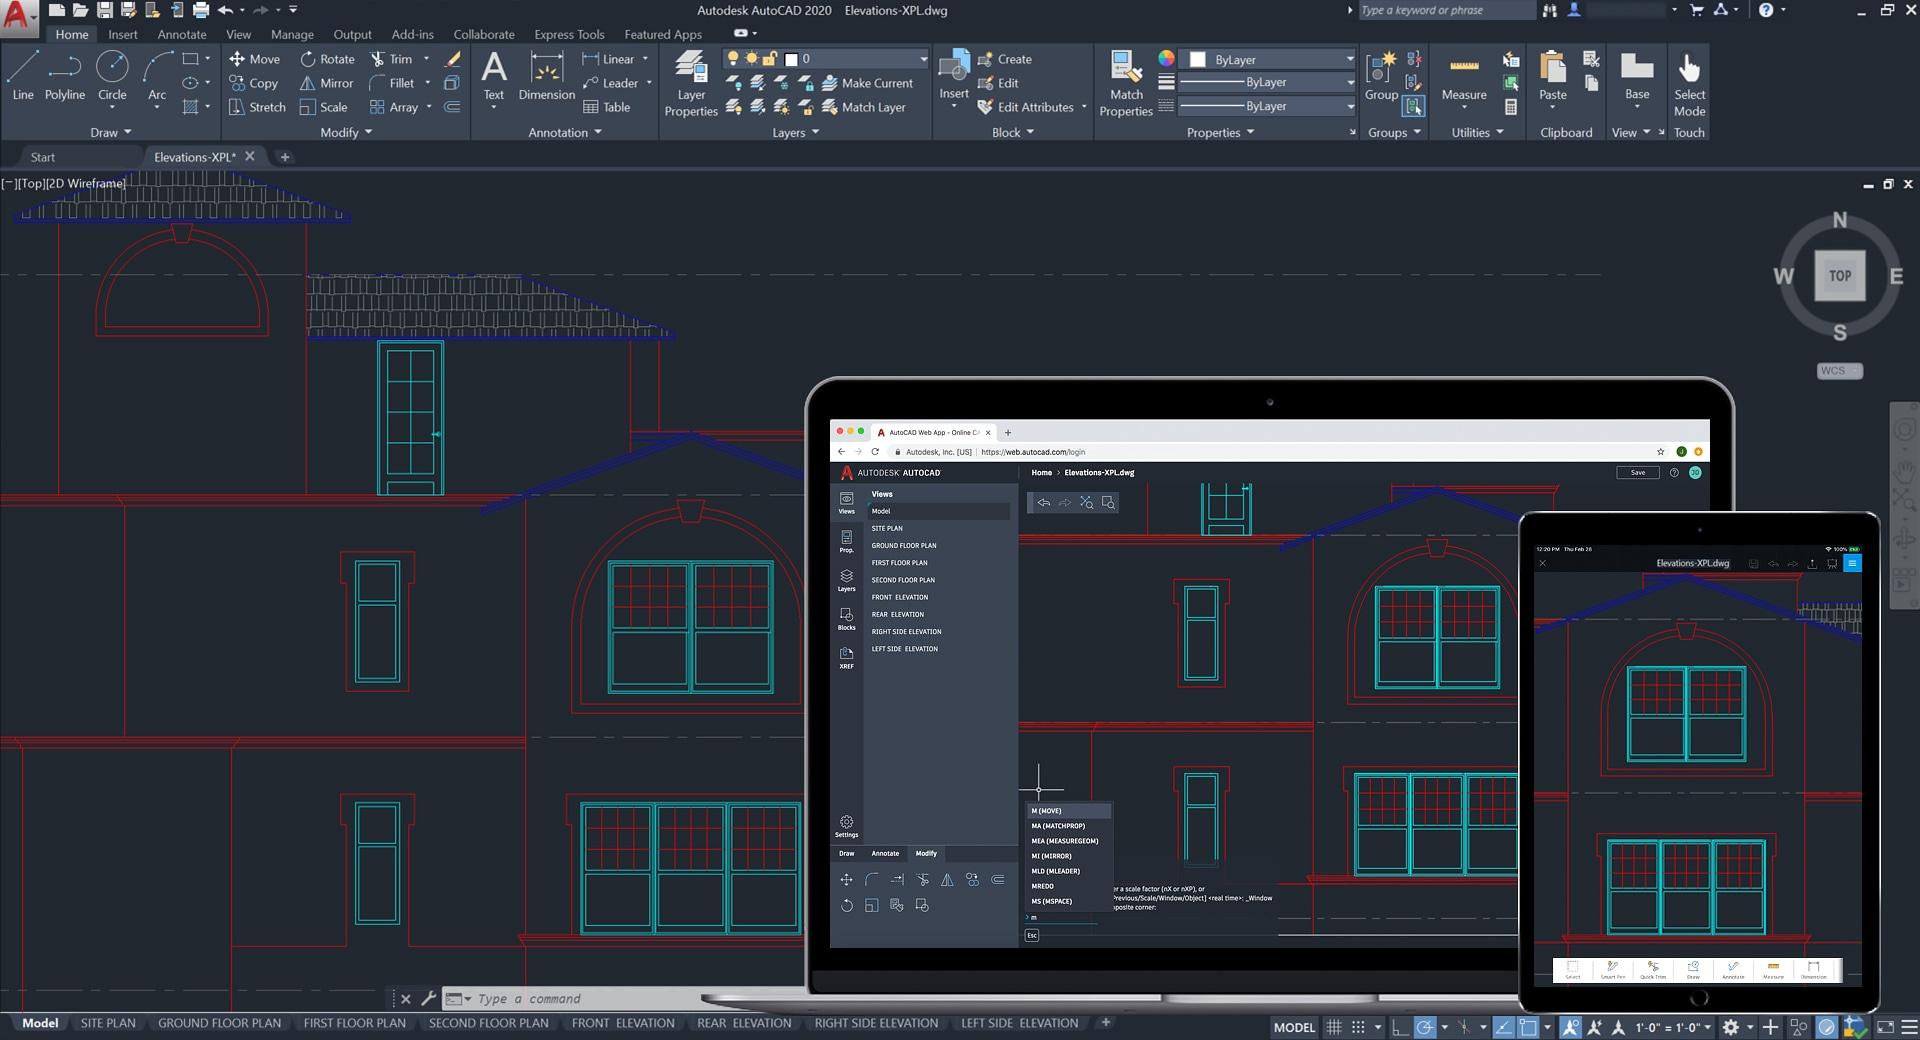 Autocad 2020의 새로운 기능 캐드 기능 Autodesk